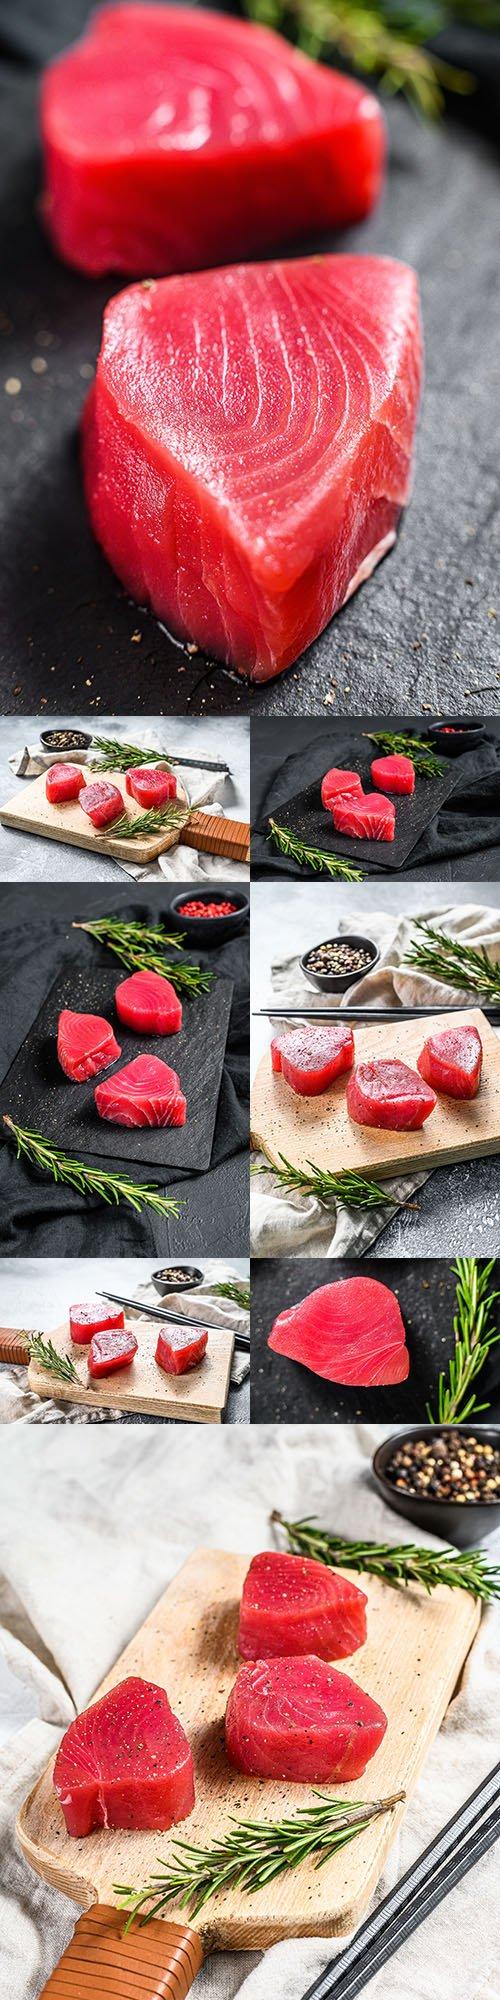 Tuna fresh steak with rosemary useful food